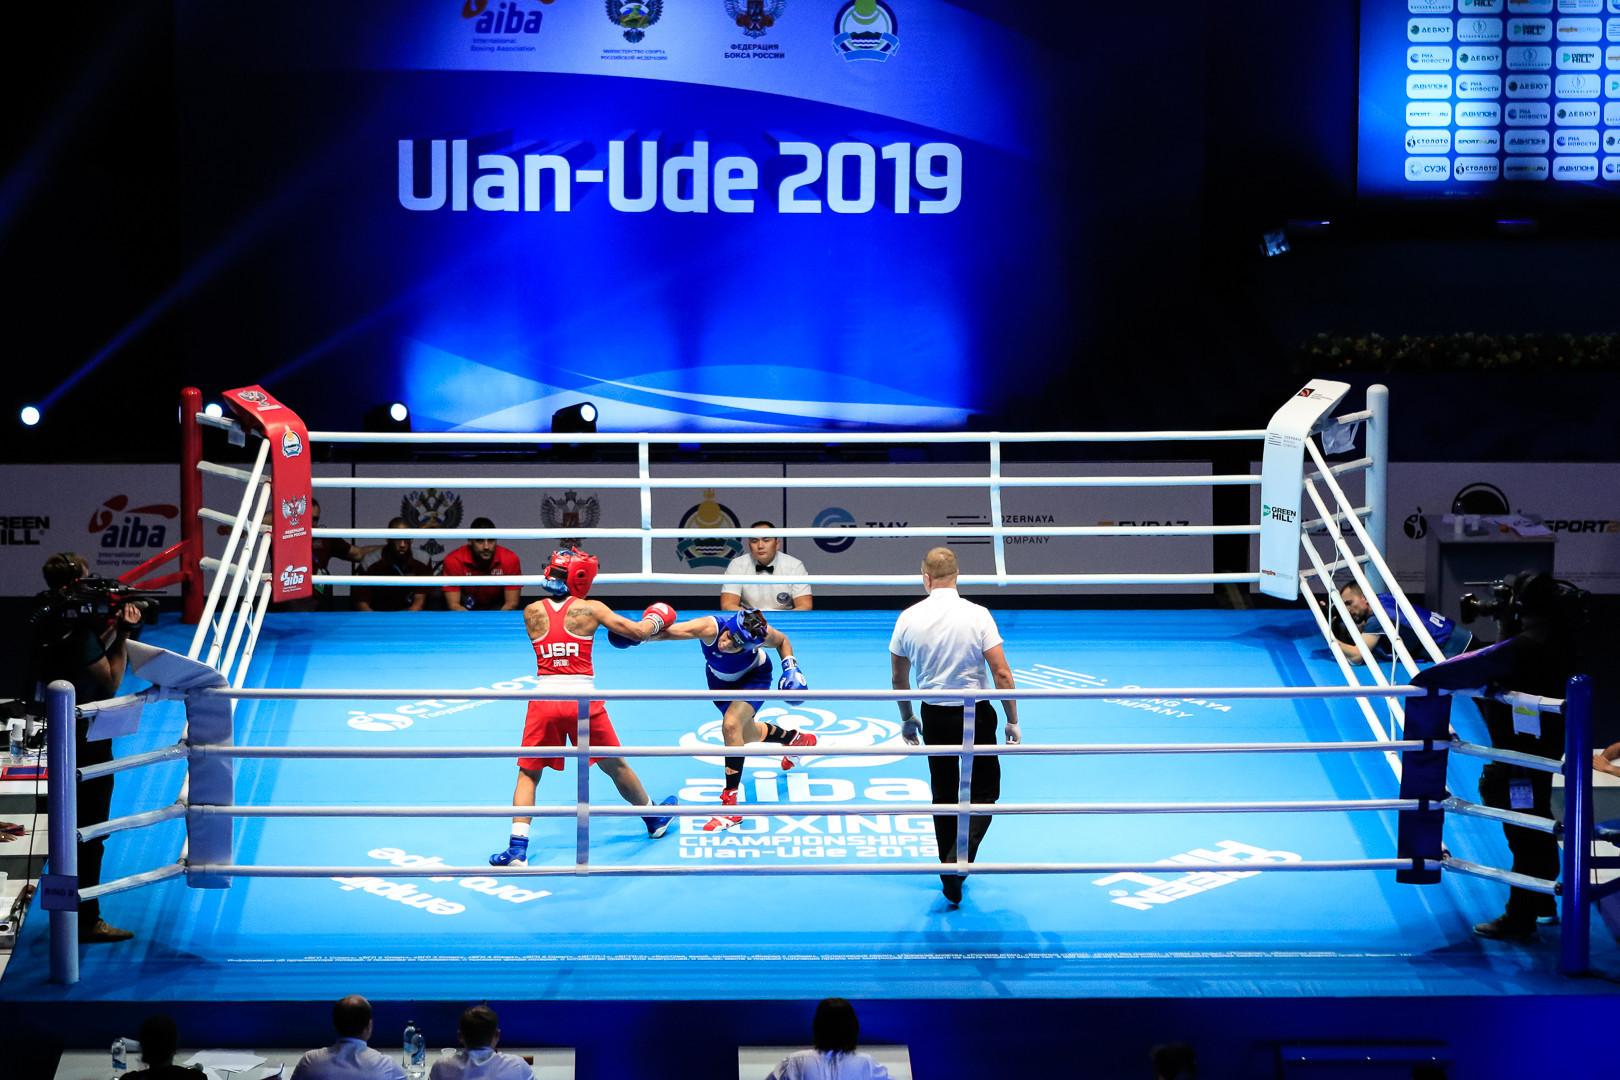 Yang stuns Chen at AIBA Women's World Boxing Championships